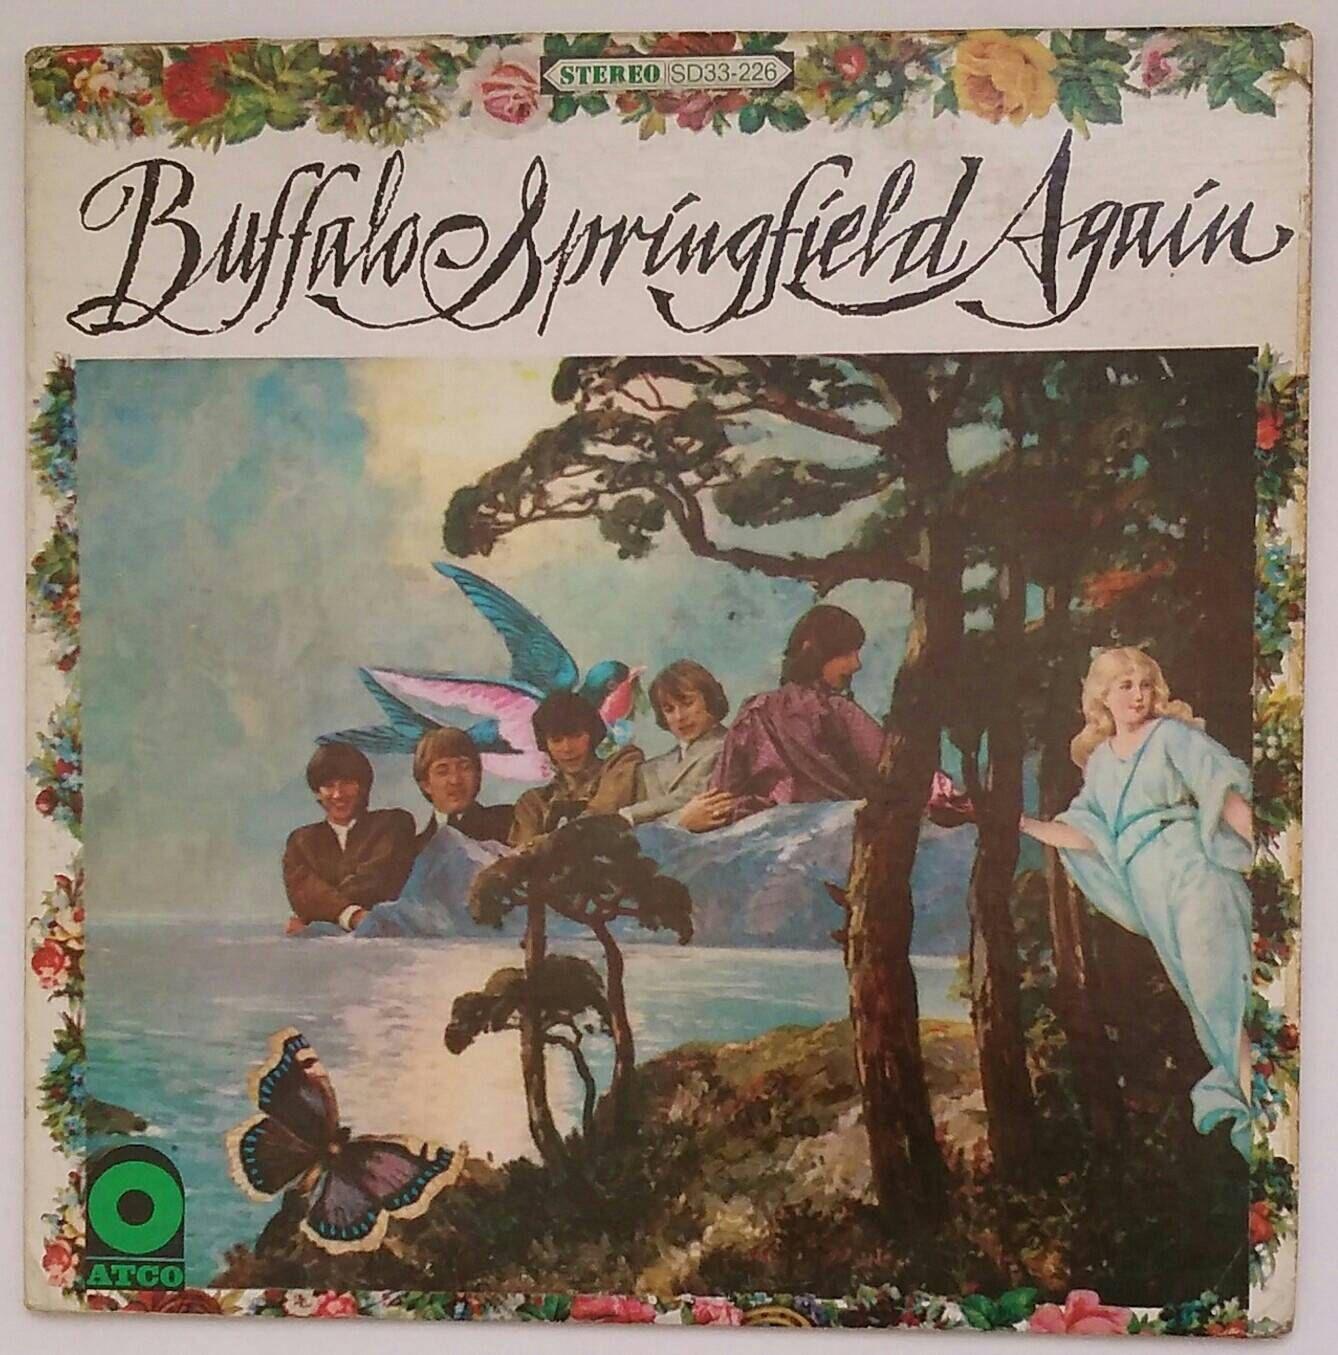 BUFFALO SPRINGFIELD - Again, 1967 stereo vinyl long-playing